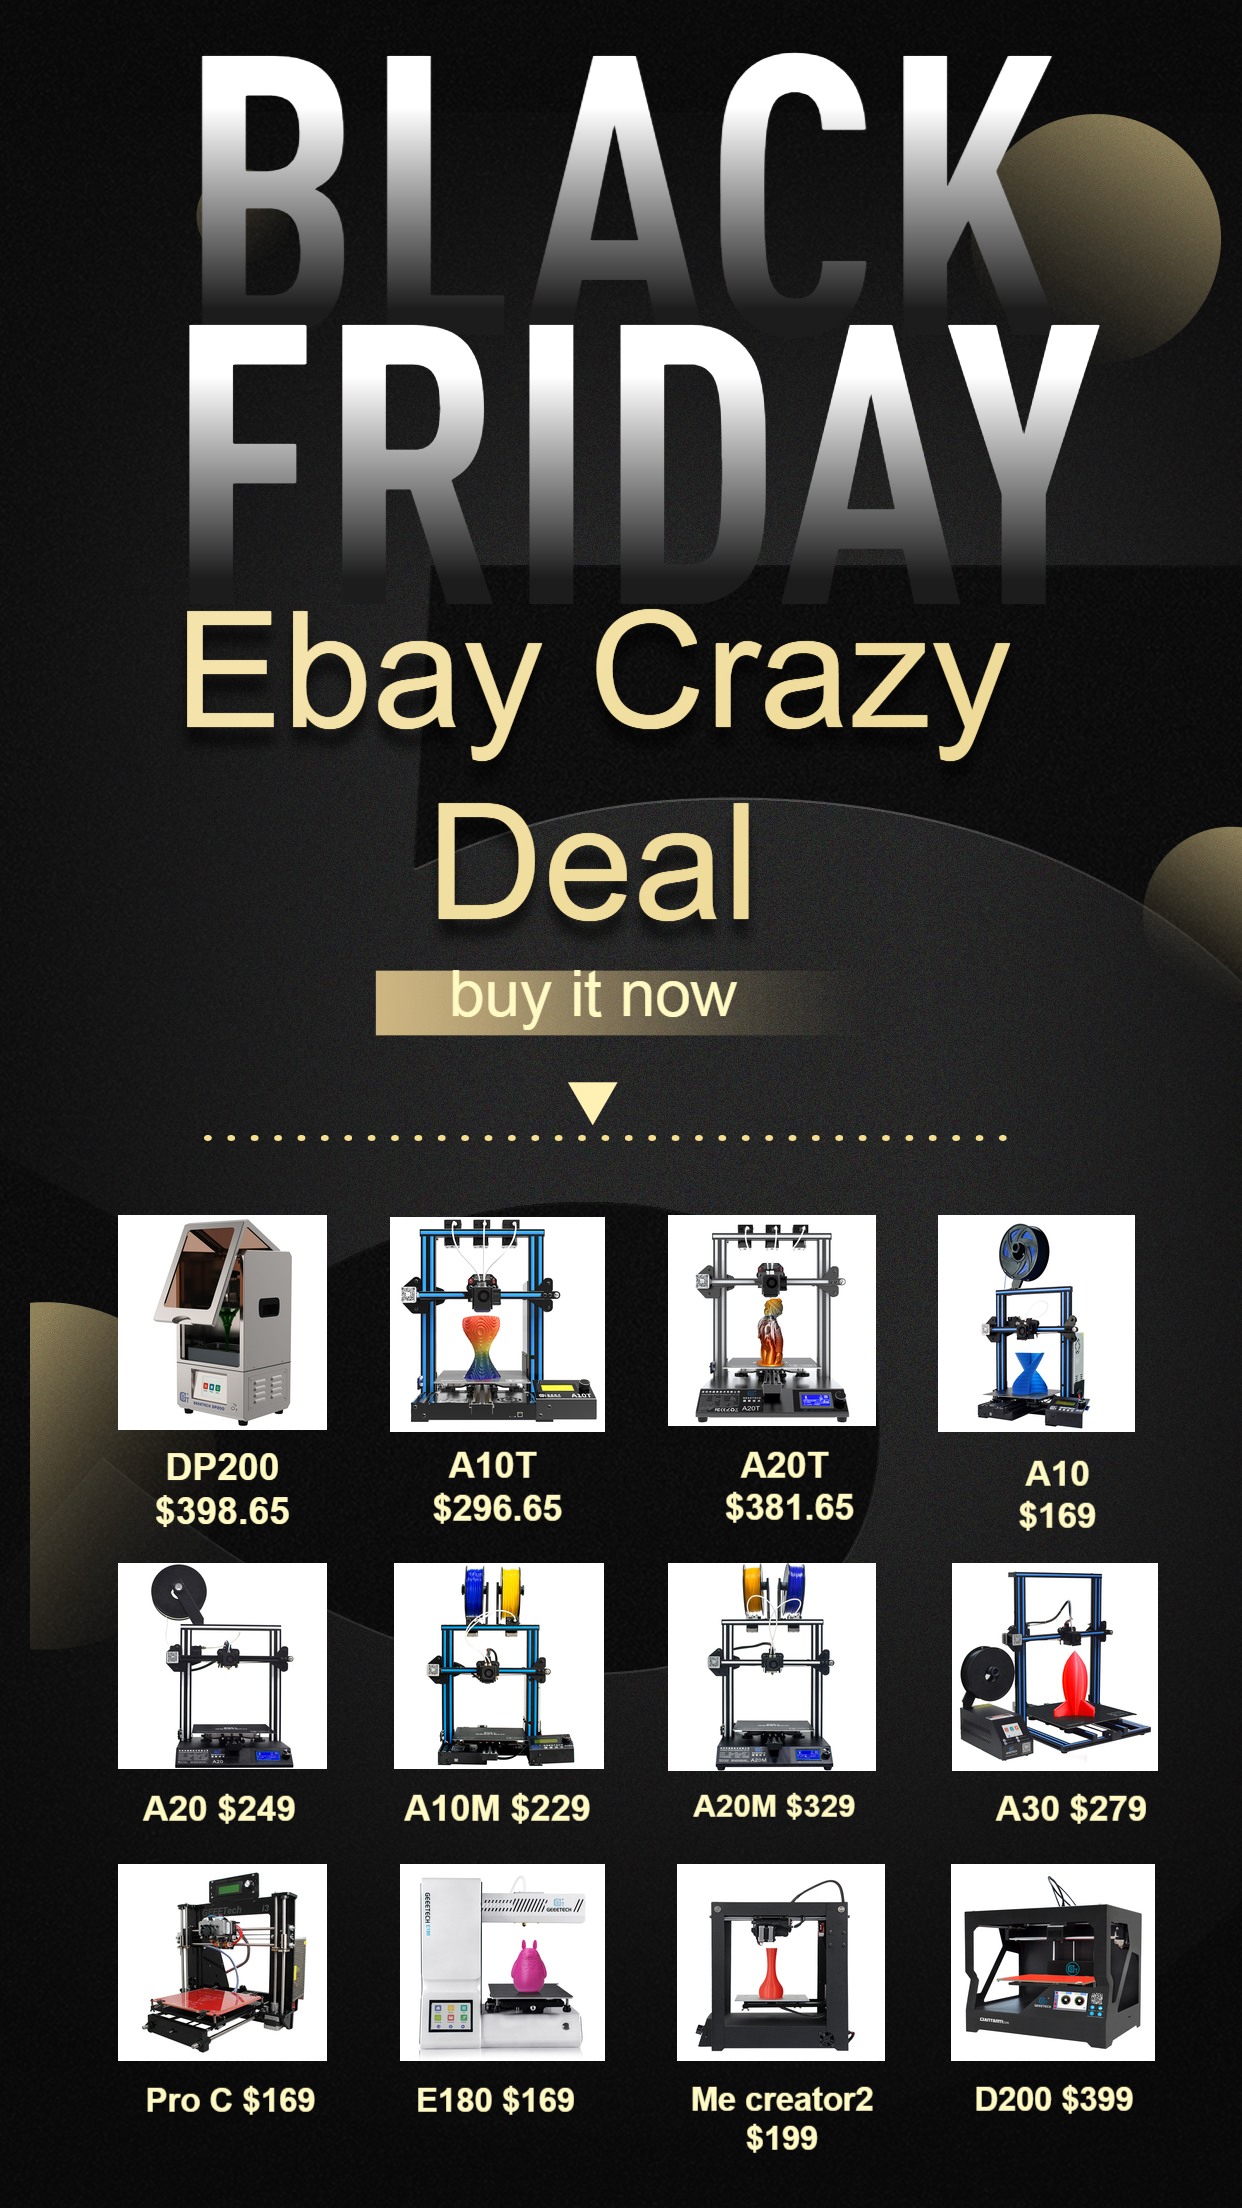 black friday deals 2019 amazon